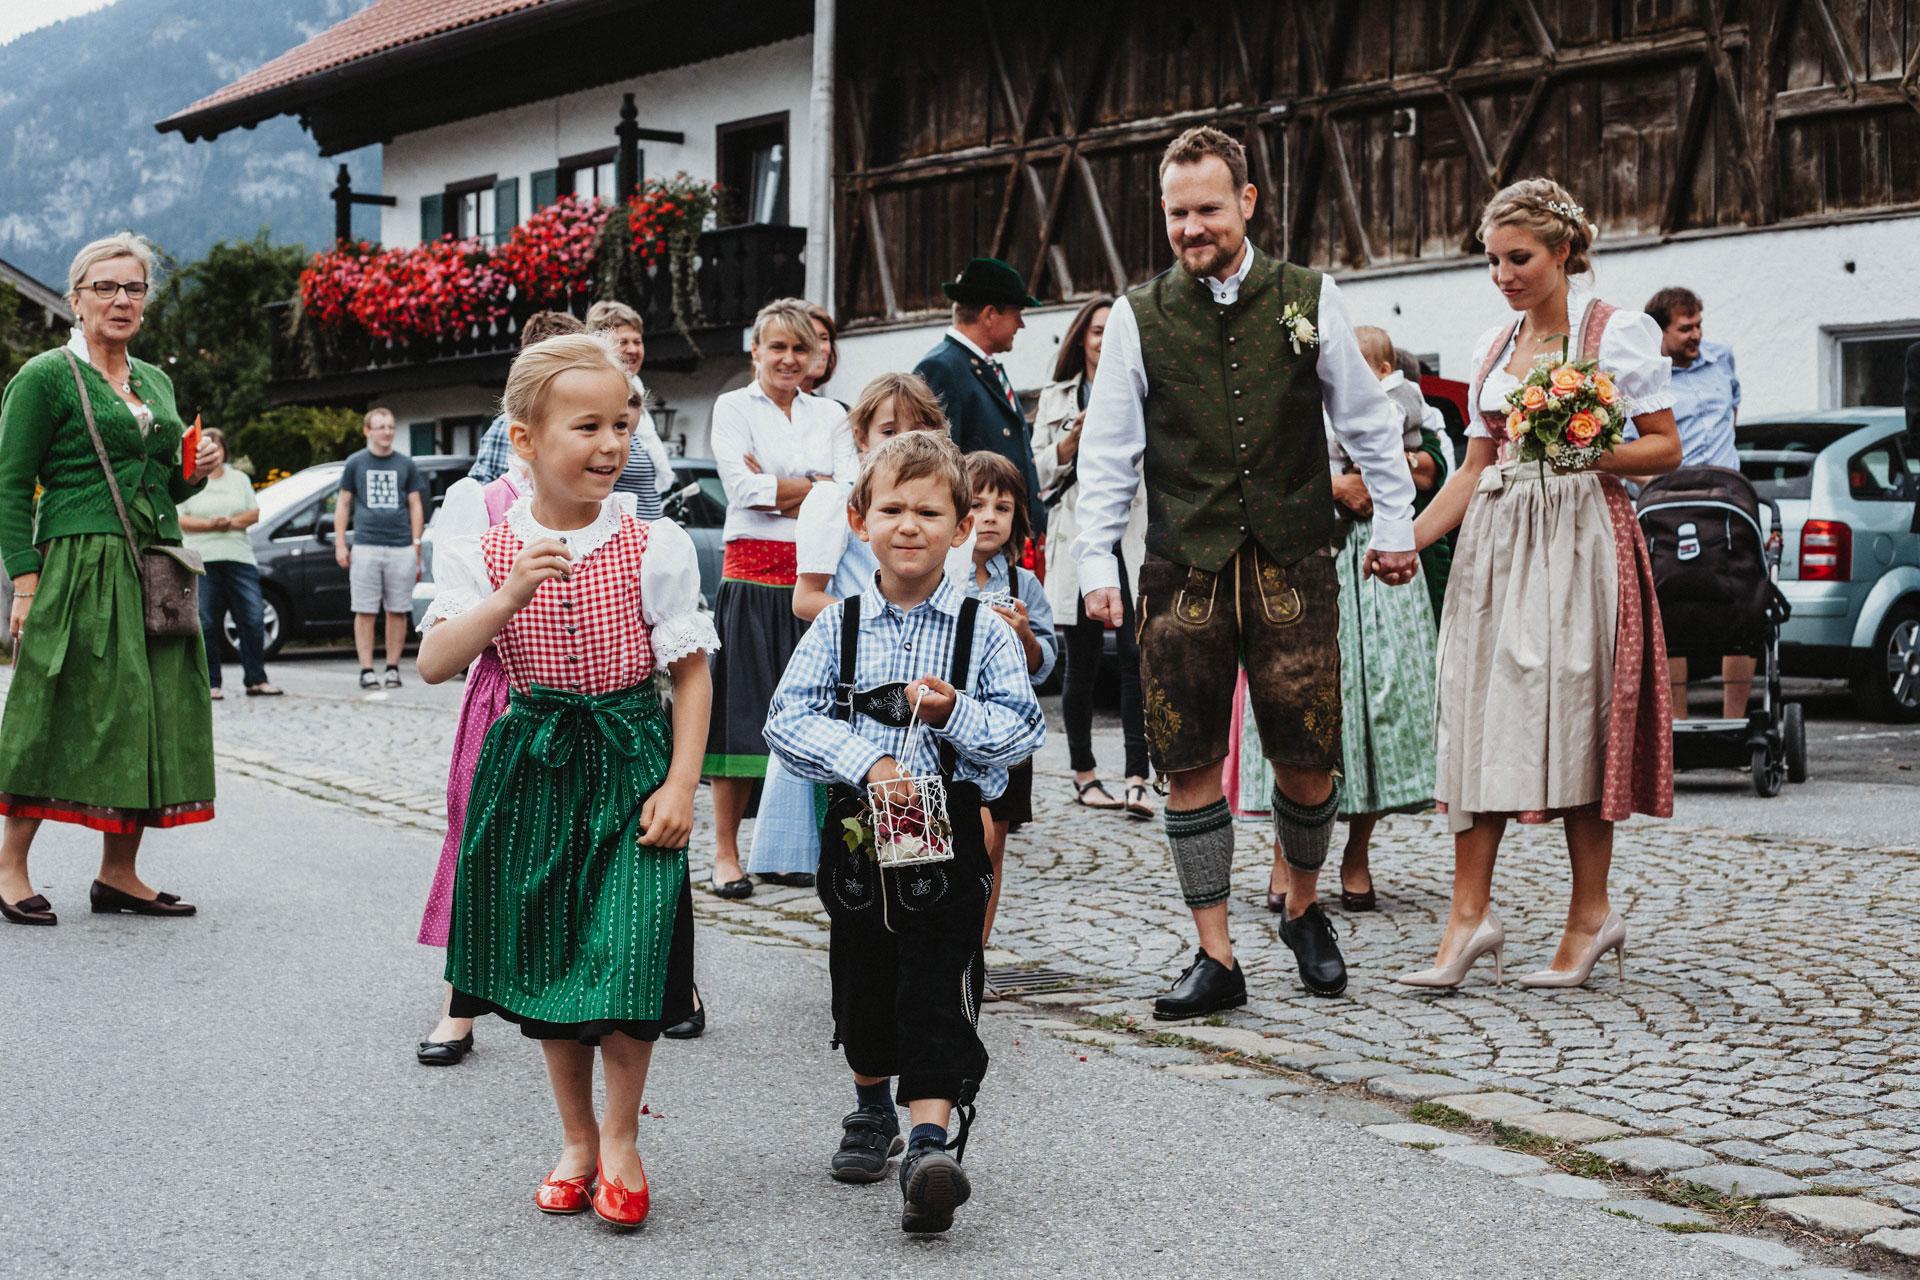 Bergherzen Hochzeitsfotografie Suppan Fotografie Wedding Garmisch-Partenkirchen Farchant Kirche Trauung Taufe Alpen